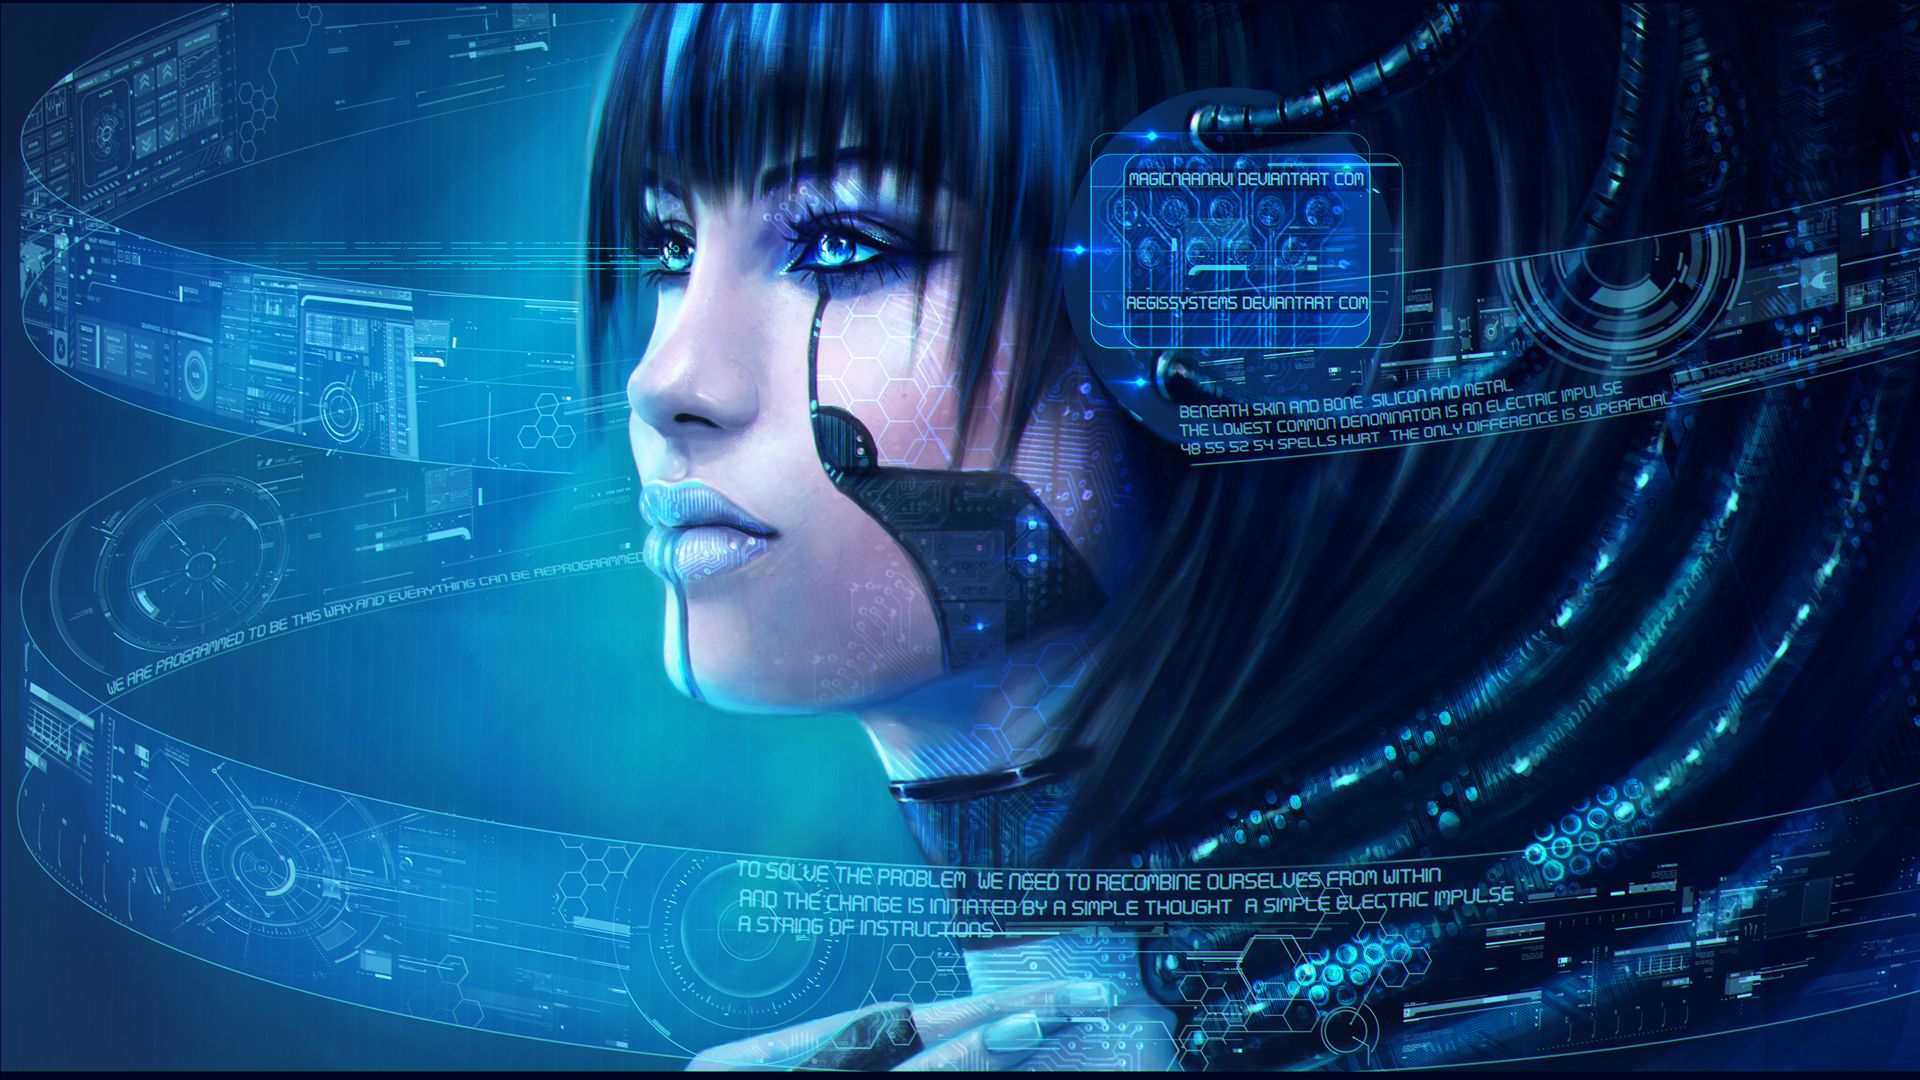 technics face robot fantasy girls cyborg cyborgs robot robots sci-fi